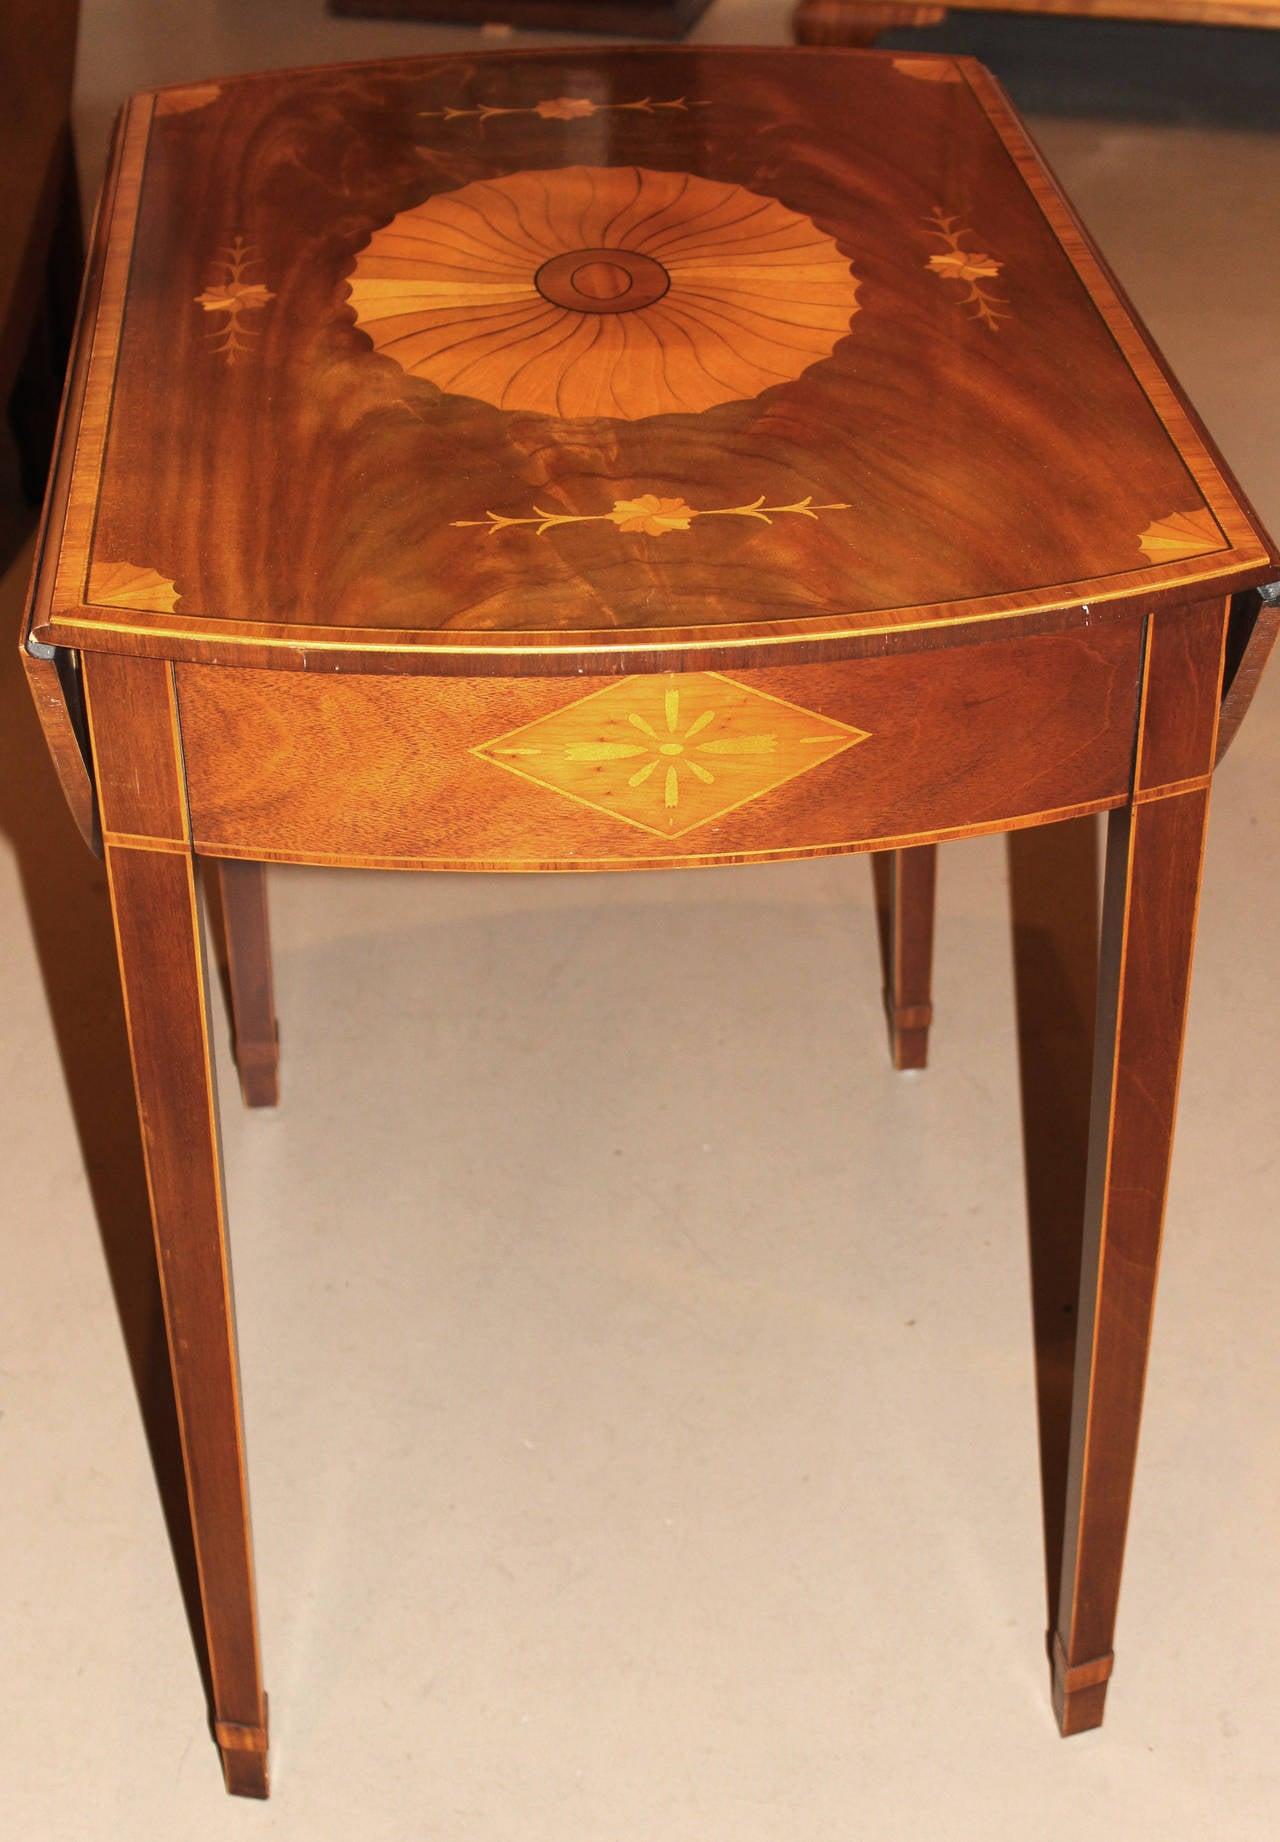 Antique Drop Leaf Table >> Baker Furniture Inlaid Pembroke Table at 1stdibs